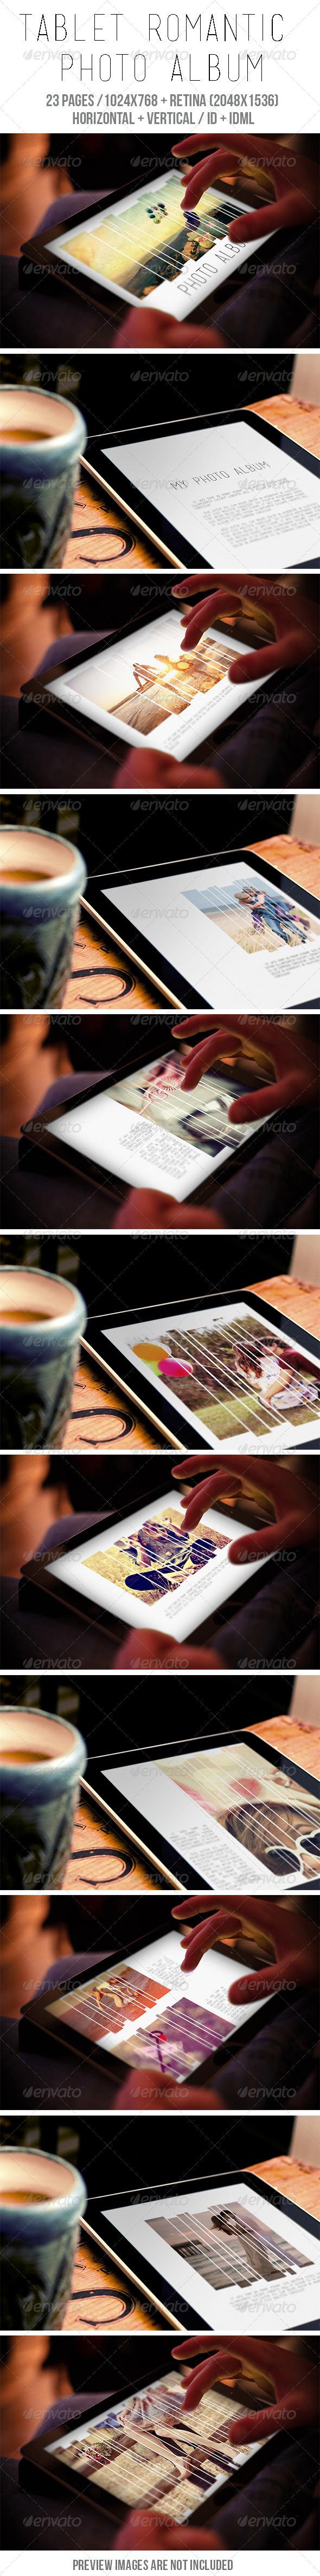 GraphicRiver Tablet Romantic Photo Album 7928500